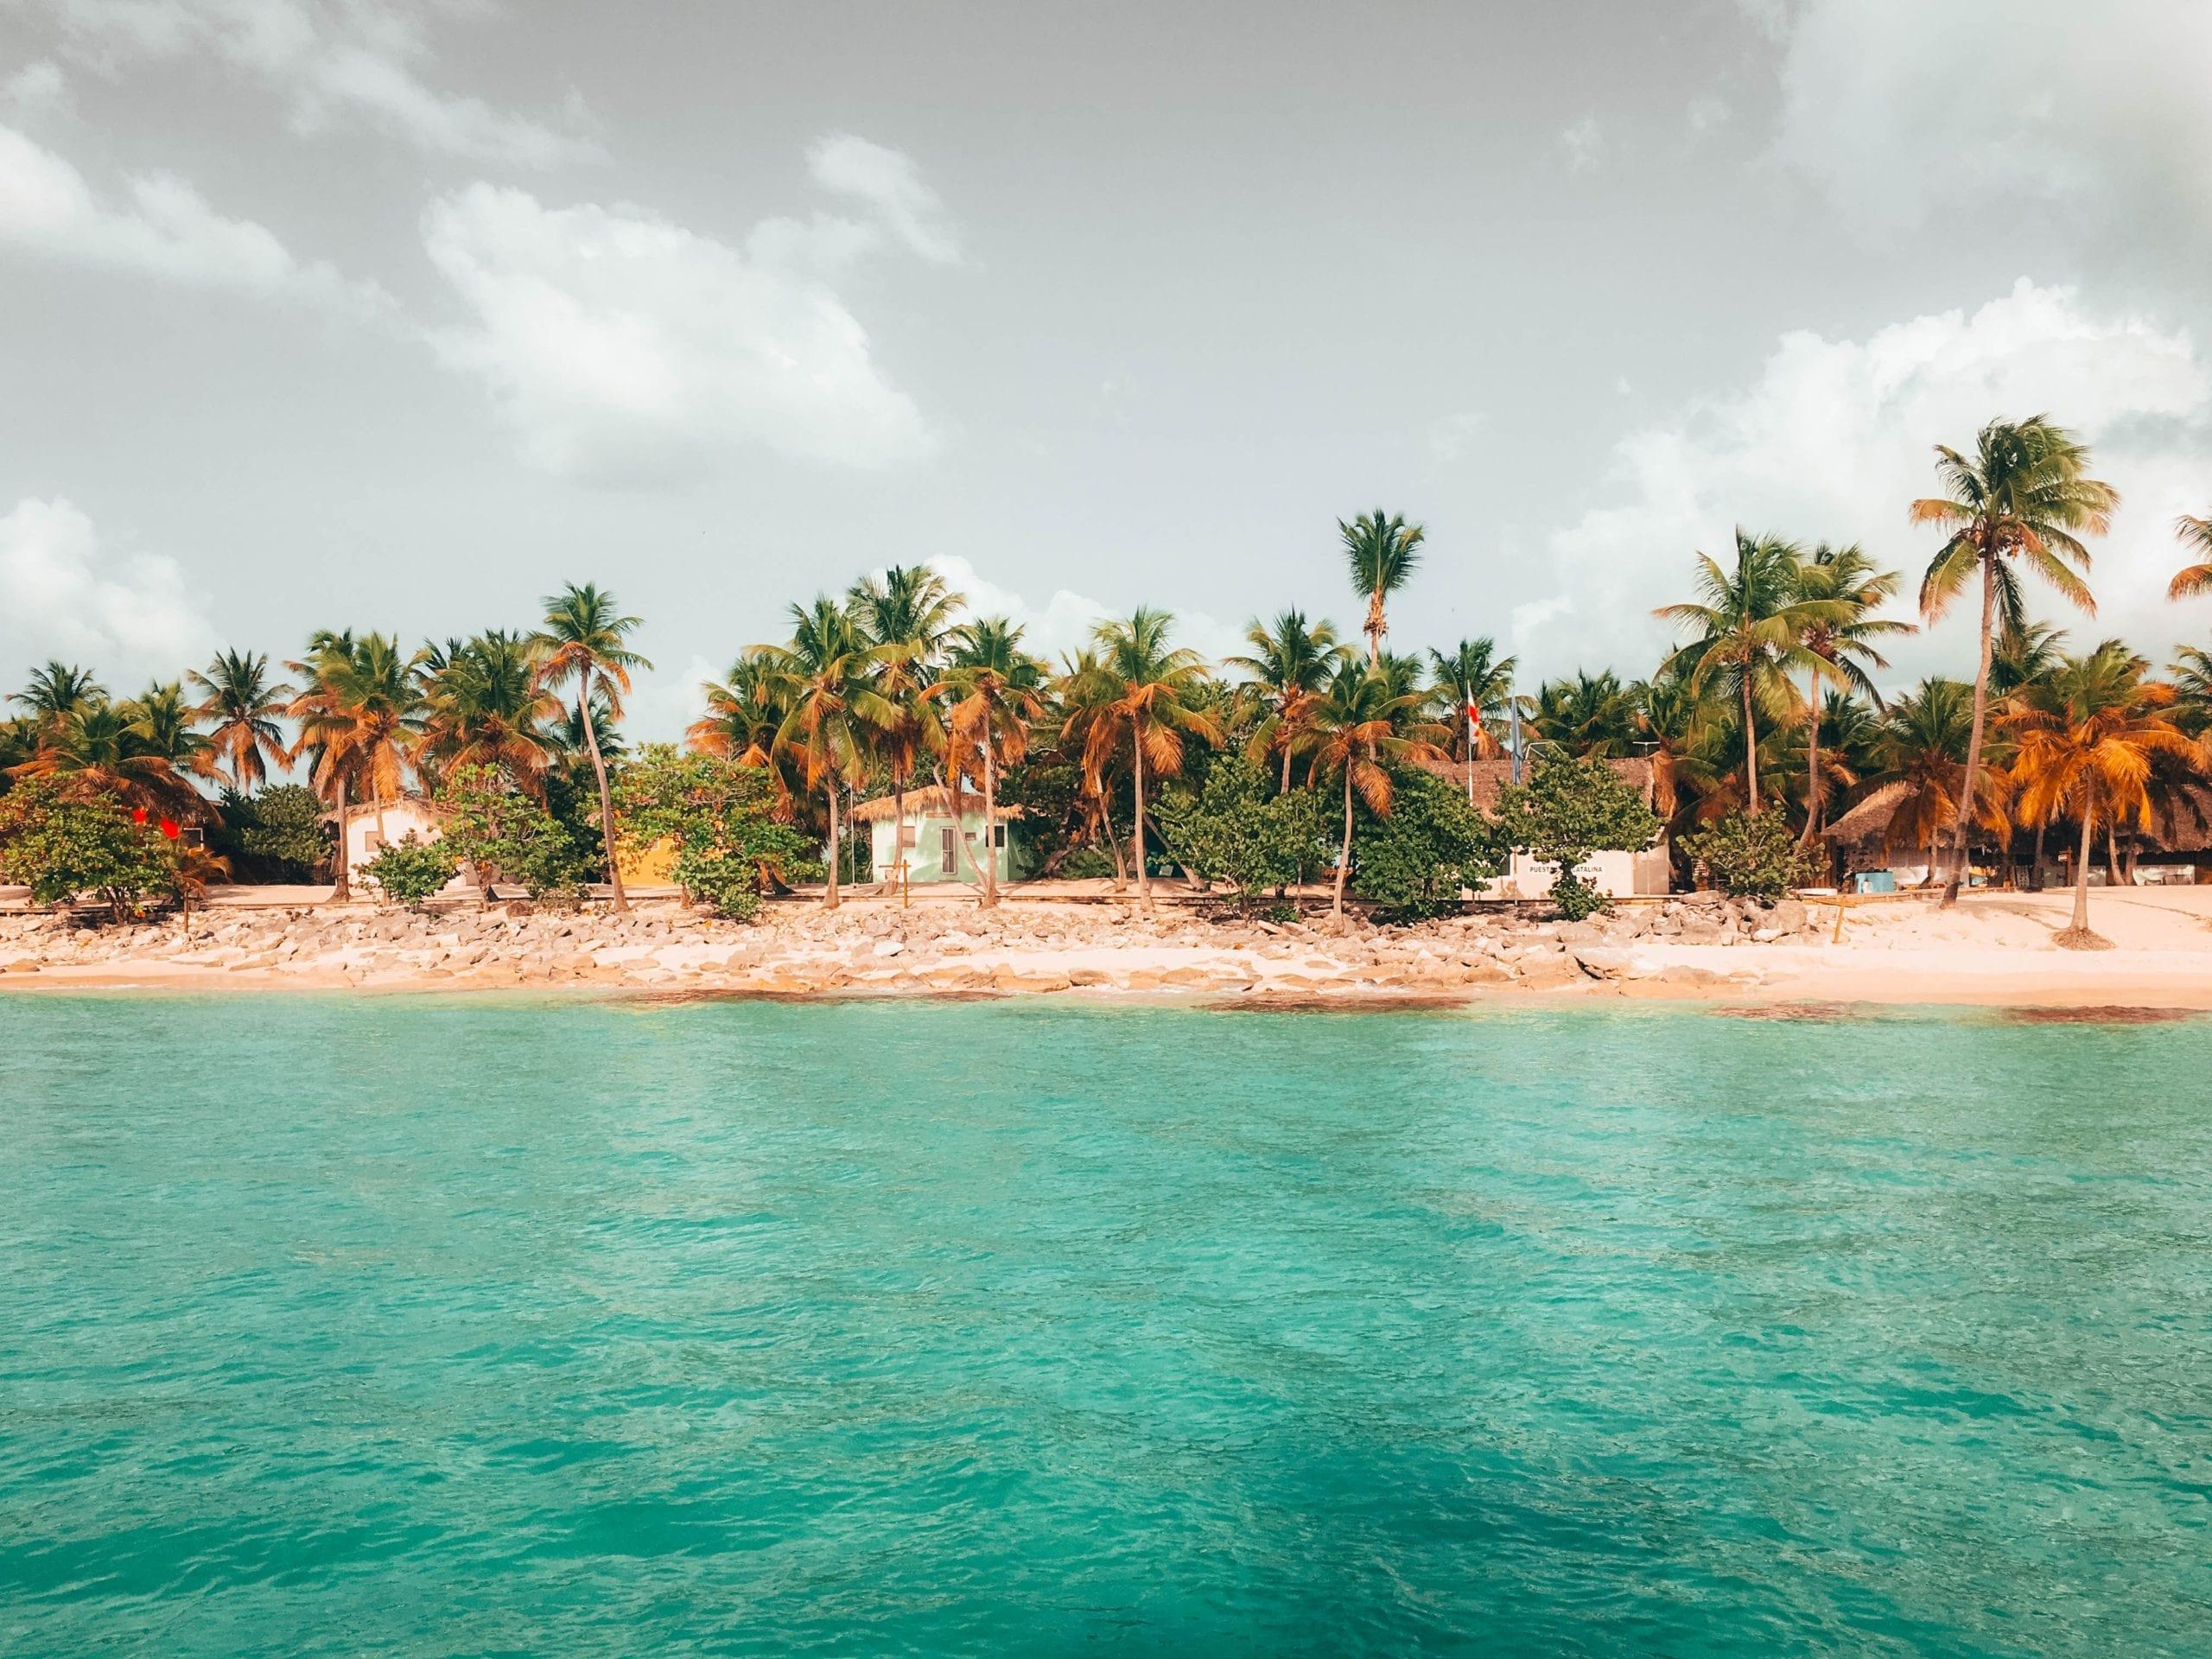 colourful beach shacks on a palm fringed beach